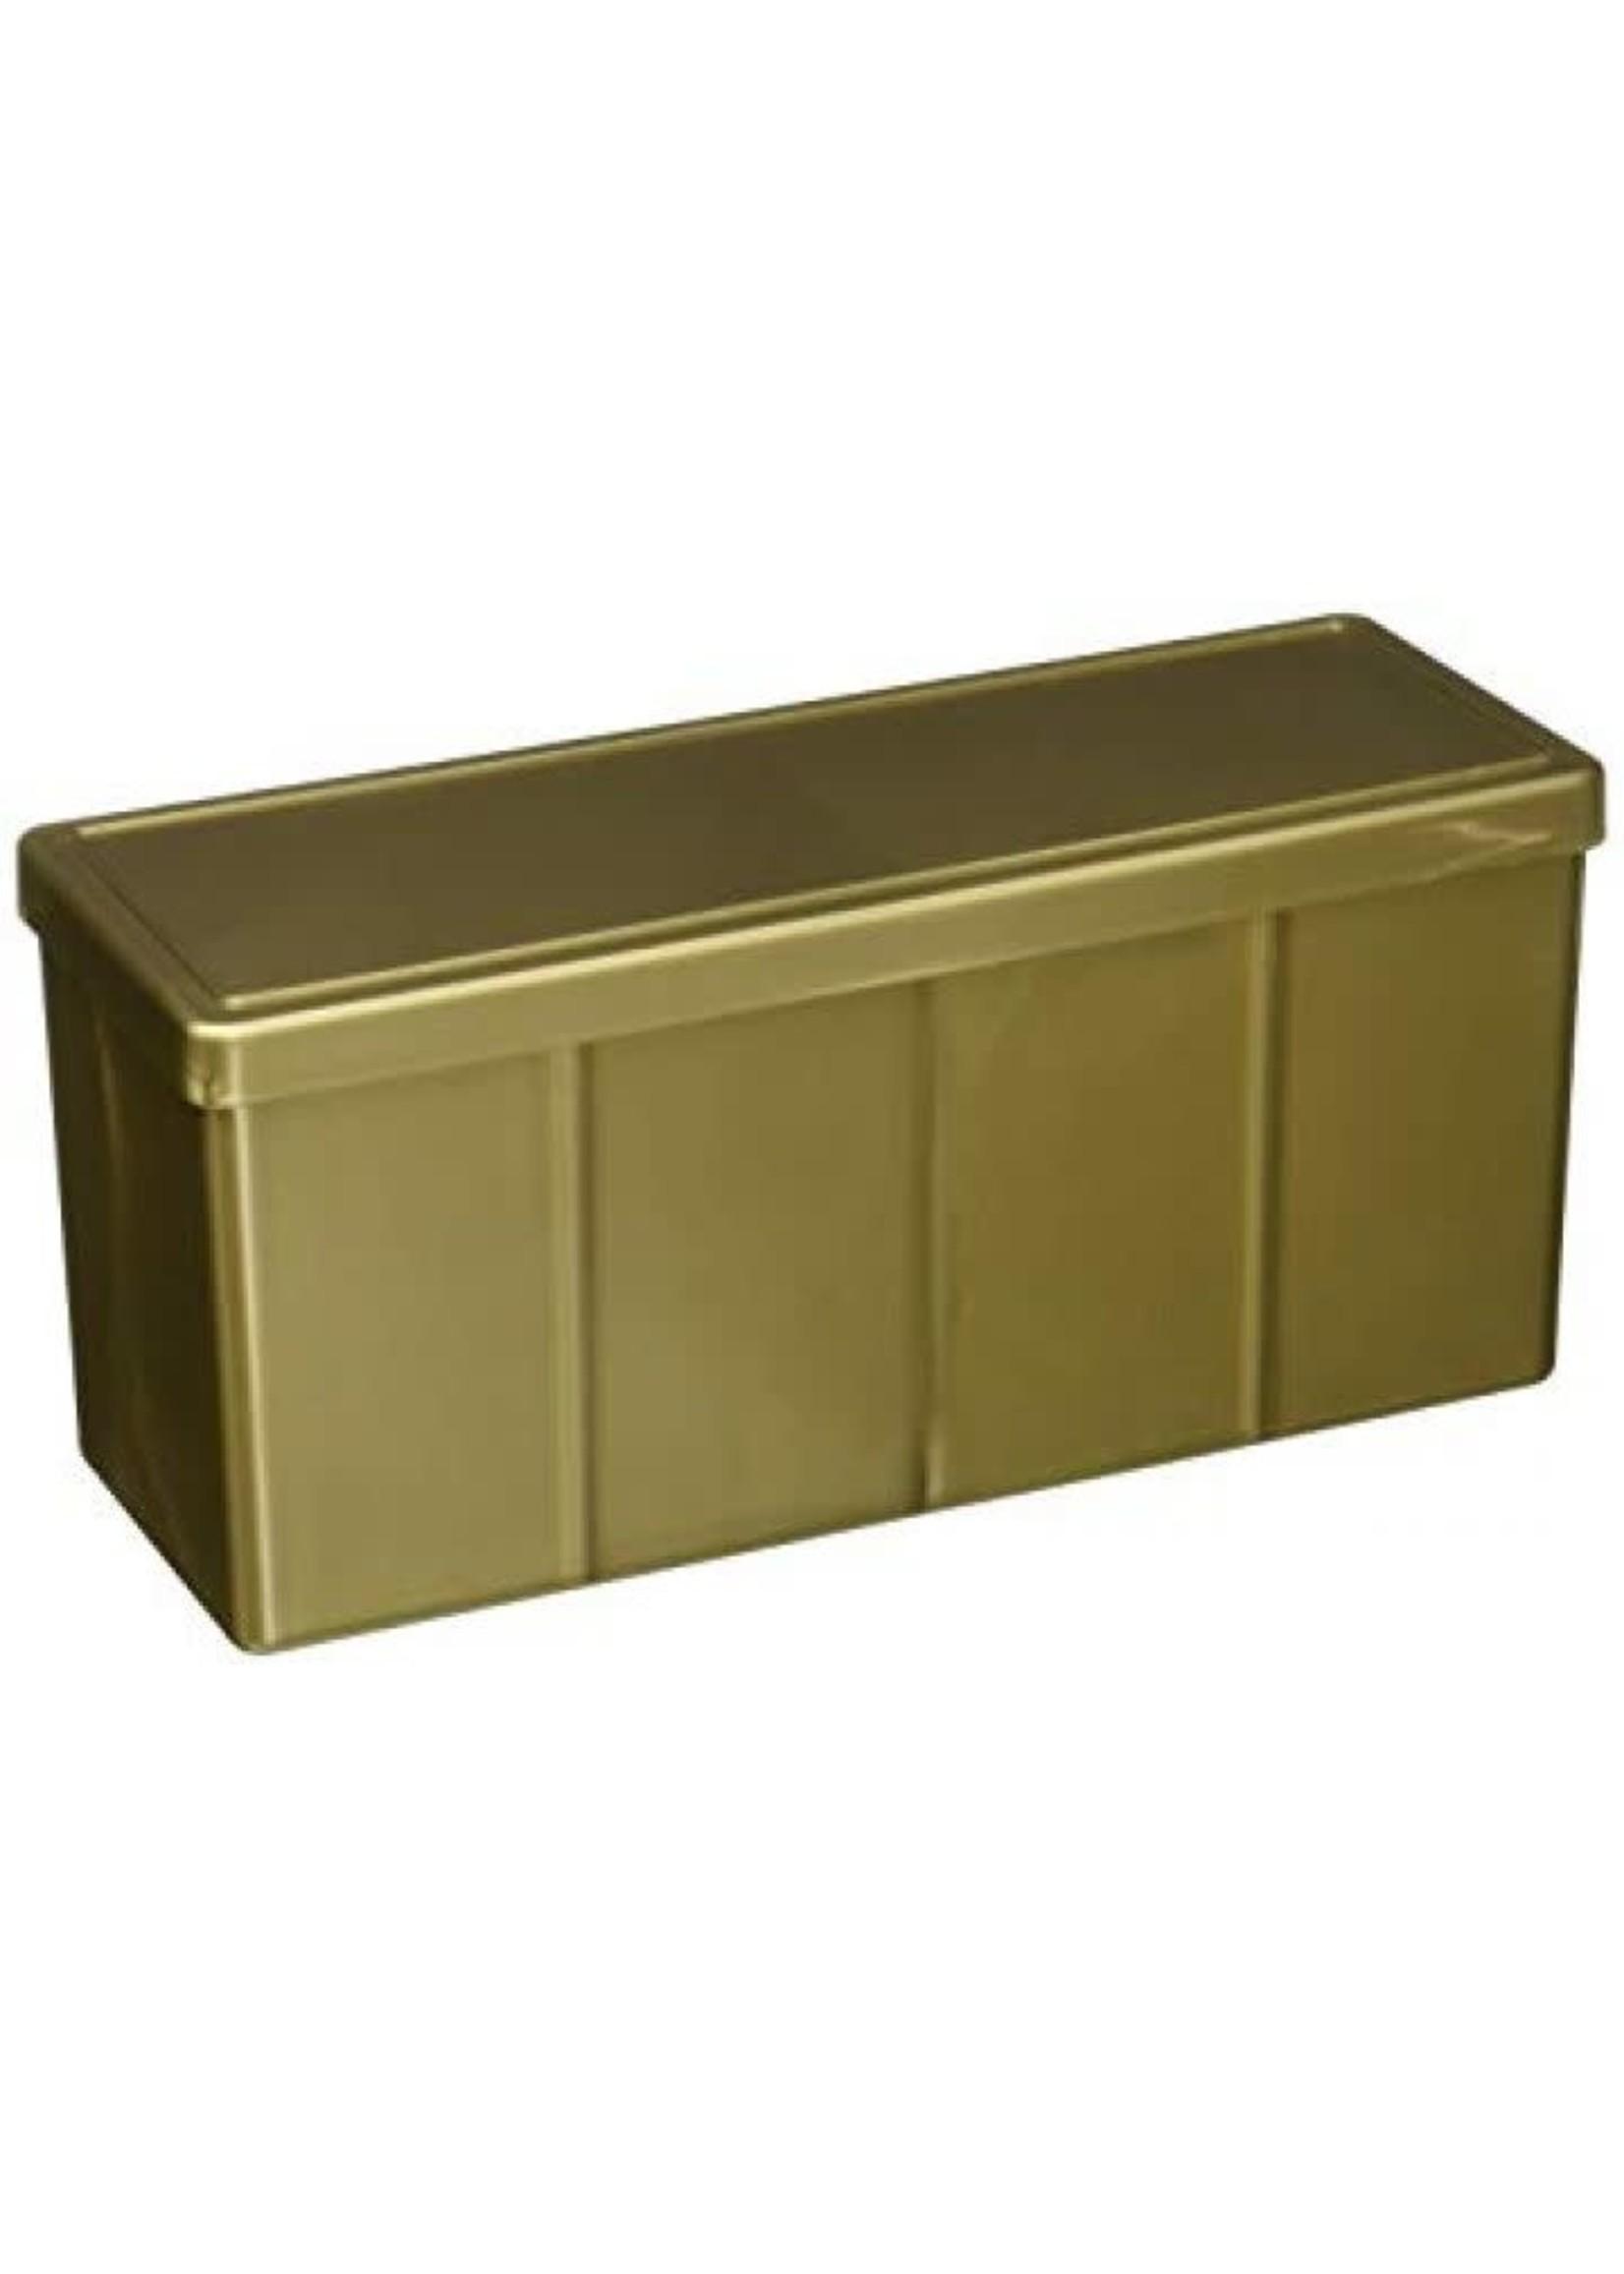 Dragonshield Four Compartment Storage Box Gold